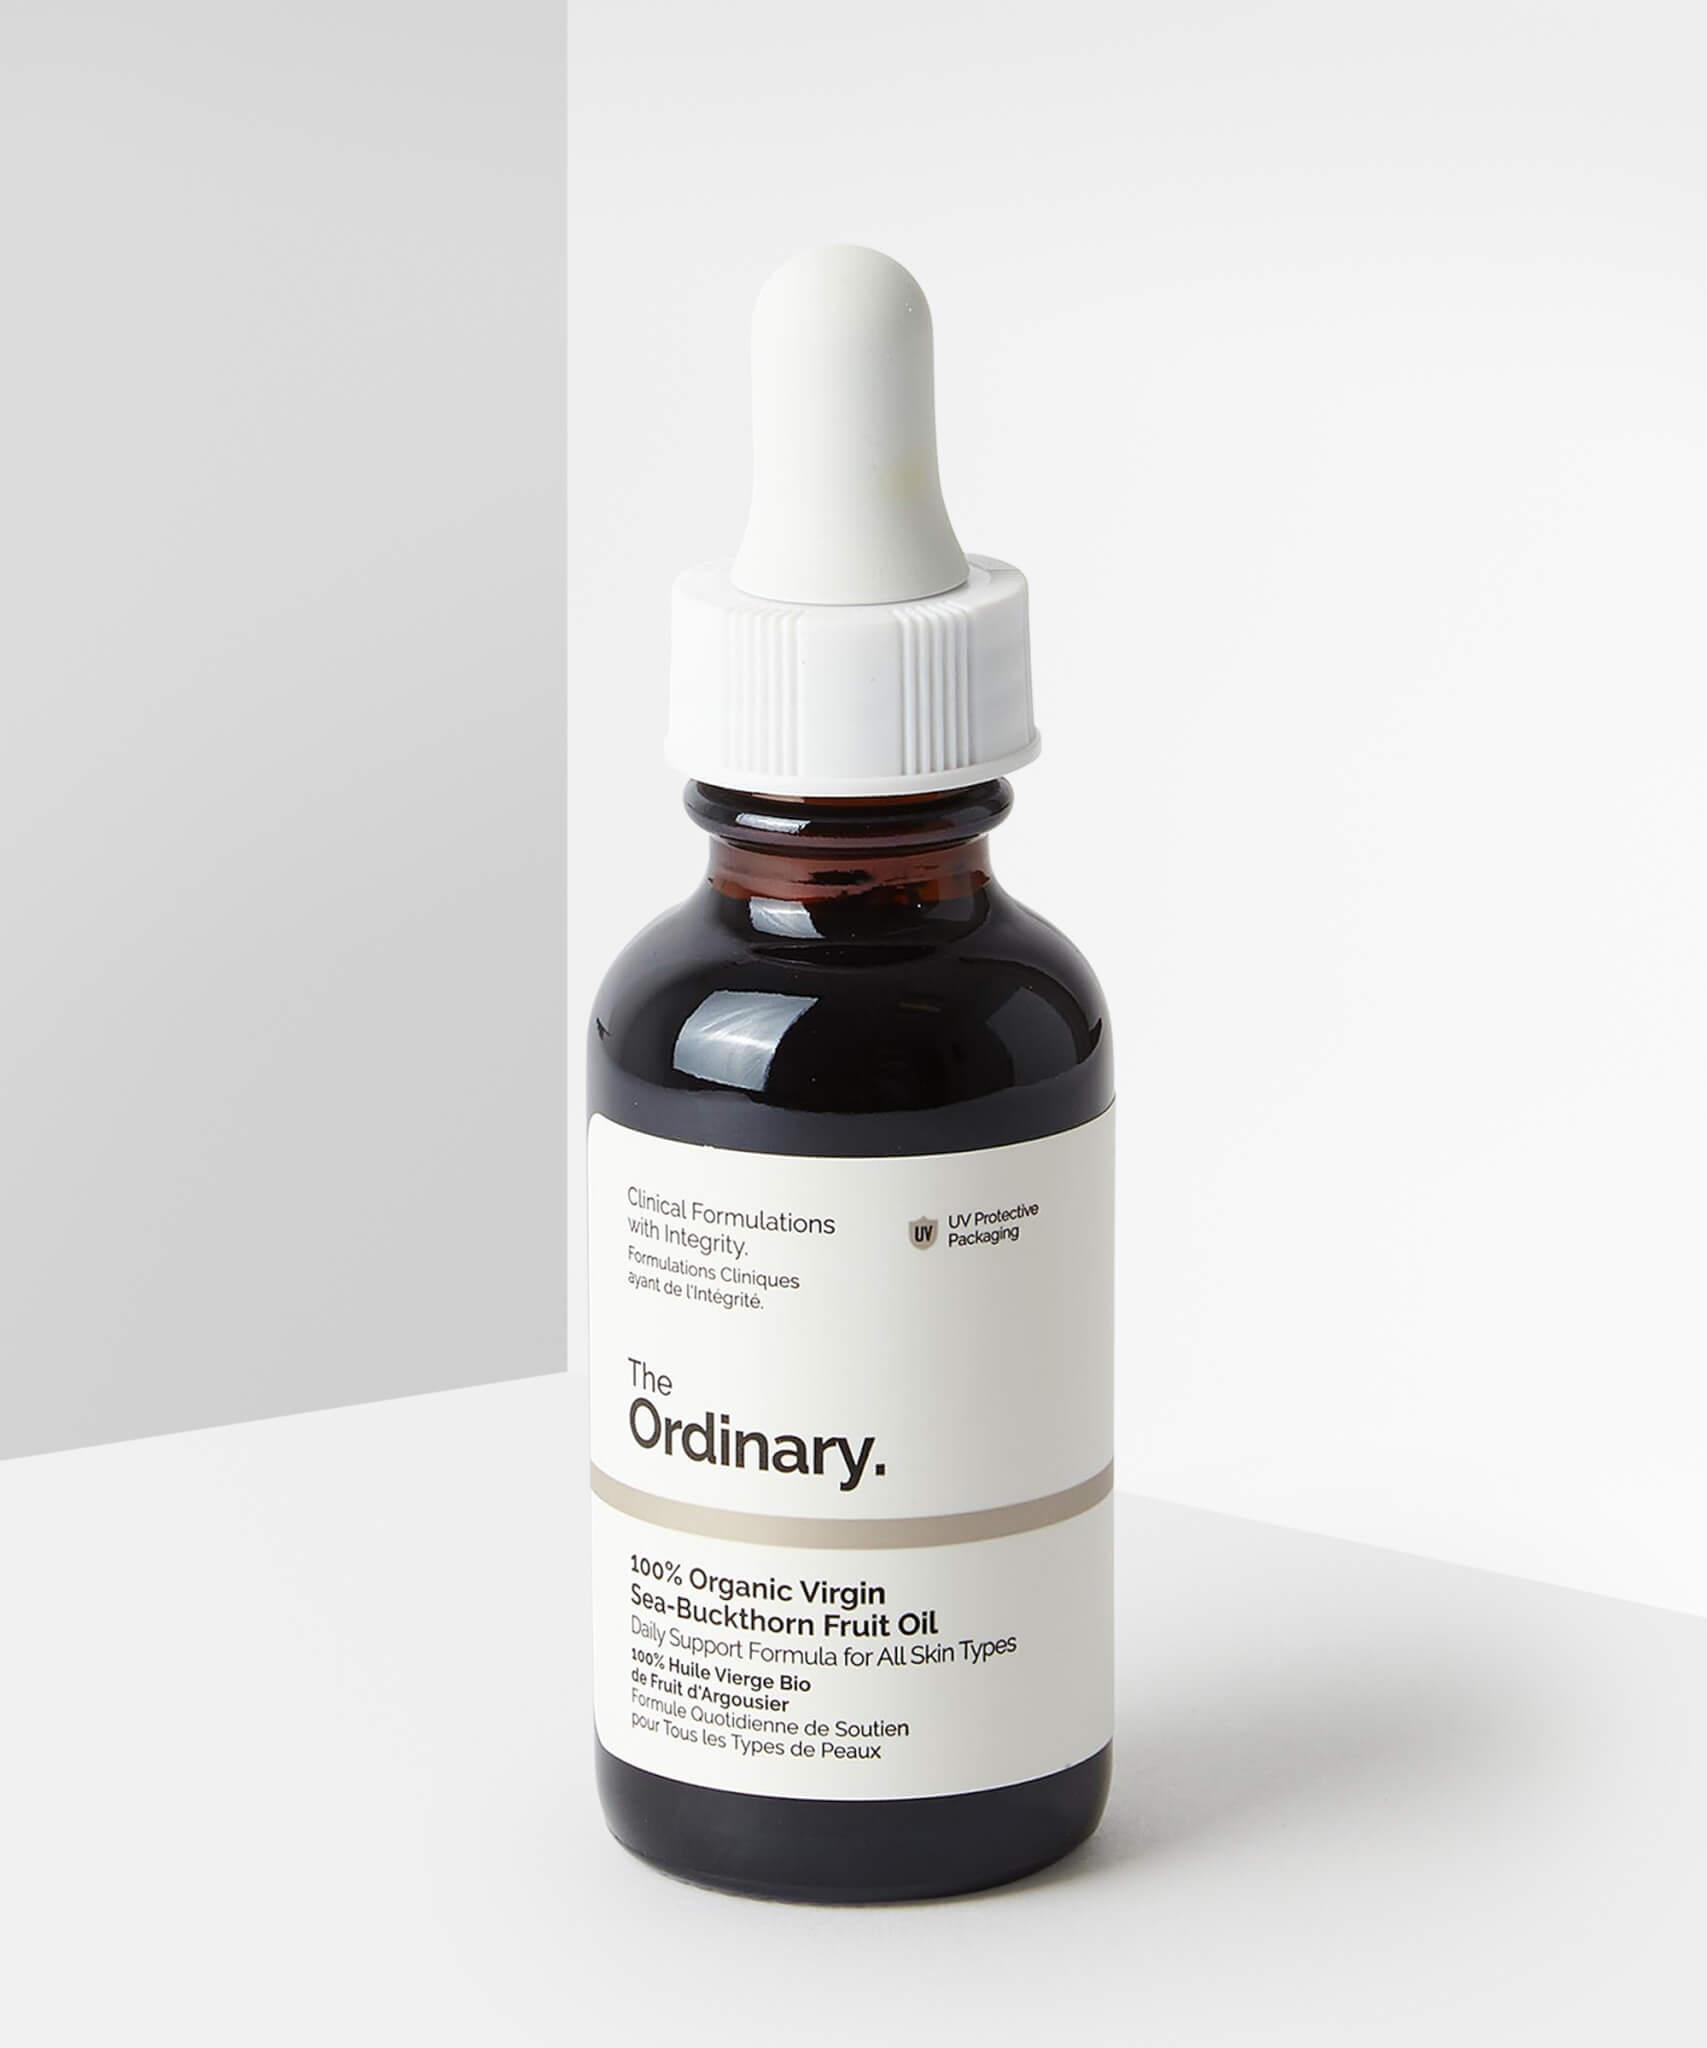 The Ordinary 有機初榨冷壓沙棘果油 HK$150/30ml 萃取自沙棘果肉,含有高濃度珍稀棕櫚油酸(Omega 7),有效滋潤和保護肌膚。同時含有其他脂肪酸及抗生素如生育酚(維他命E)、類胡蘿蔔素及番茄紅素,有助於保護皮膚免受自由基的傷害。產品的天然深橙色源於高濃度的類胡蘿蔔素和番茄紅素。